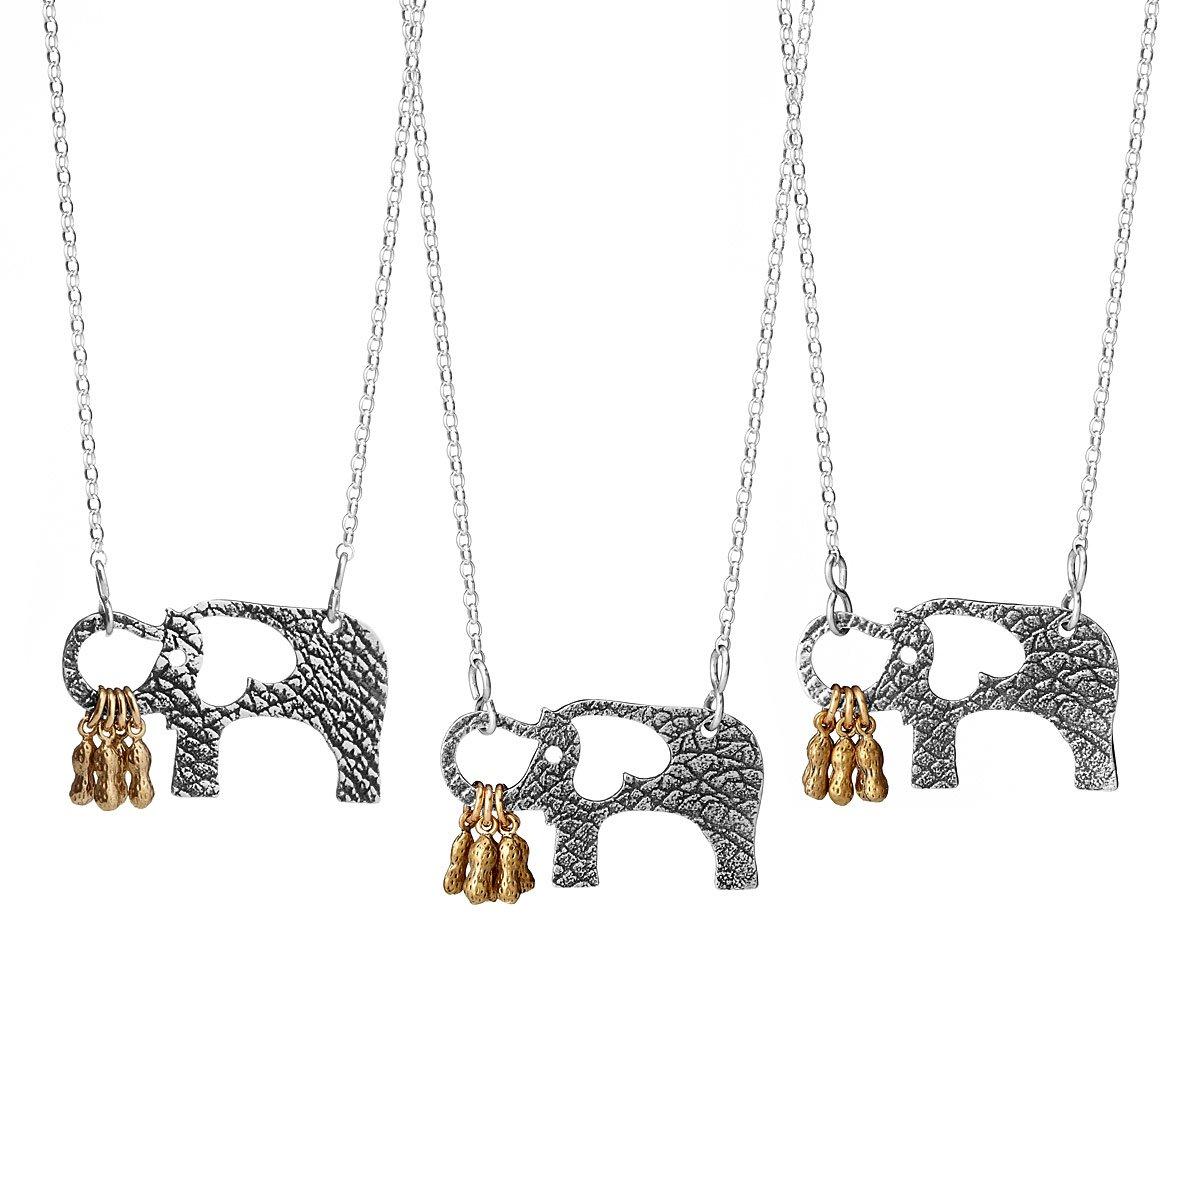 ElephantsandherPeanutsNecklace.jpg